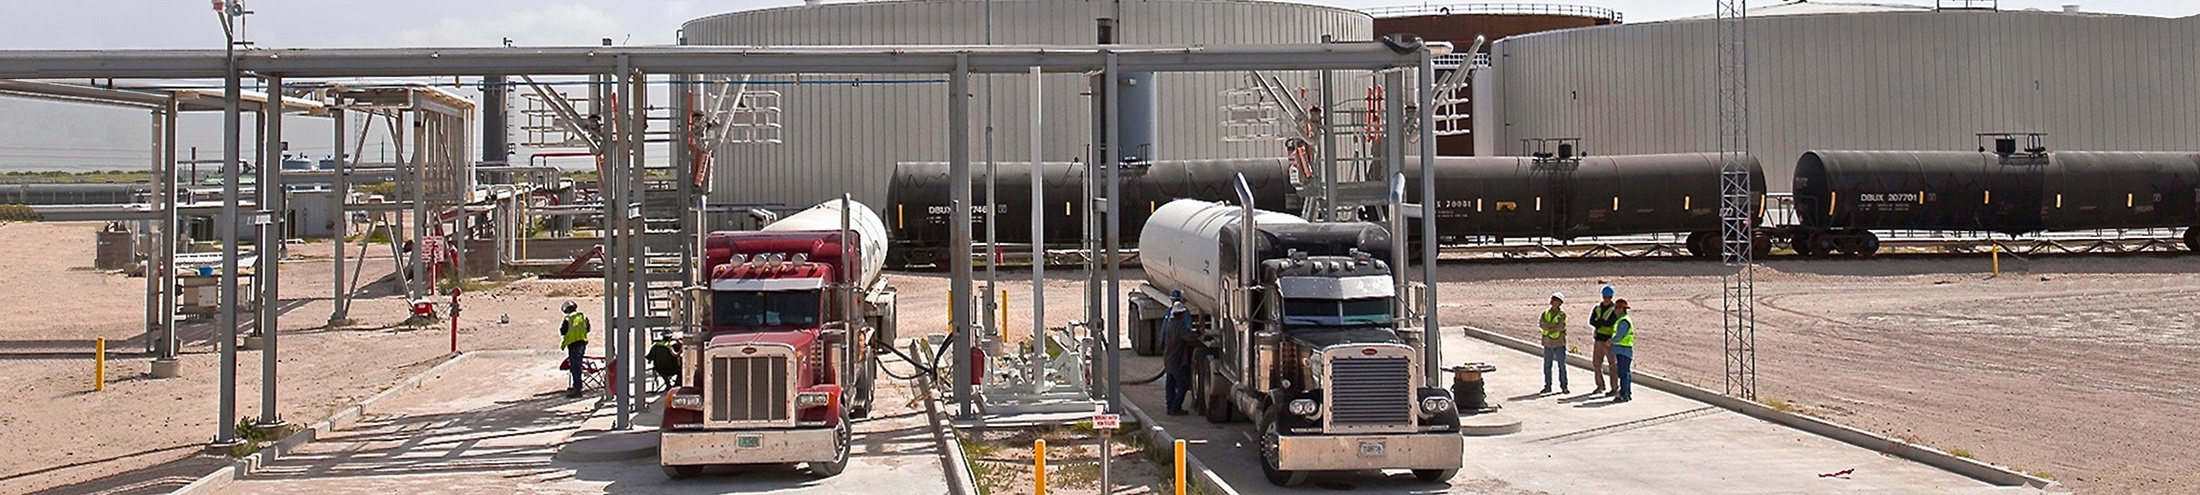 LPG Truck & Rail Terminal Engineering Construction Services .jpg